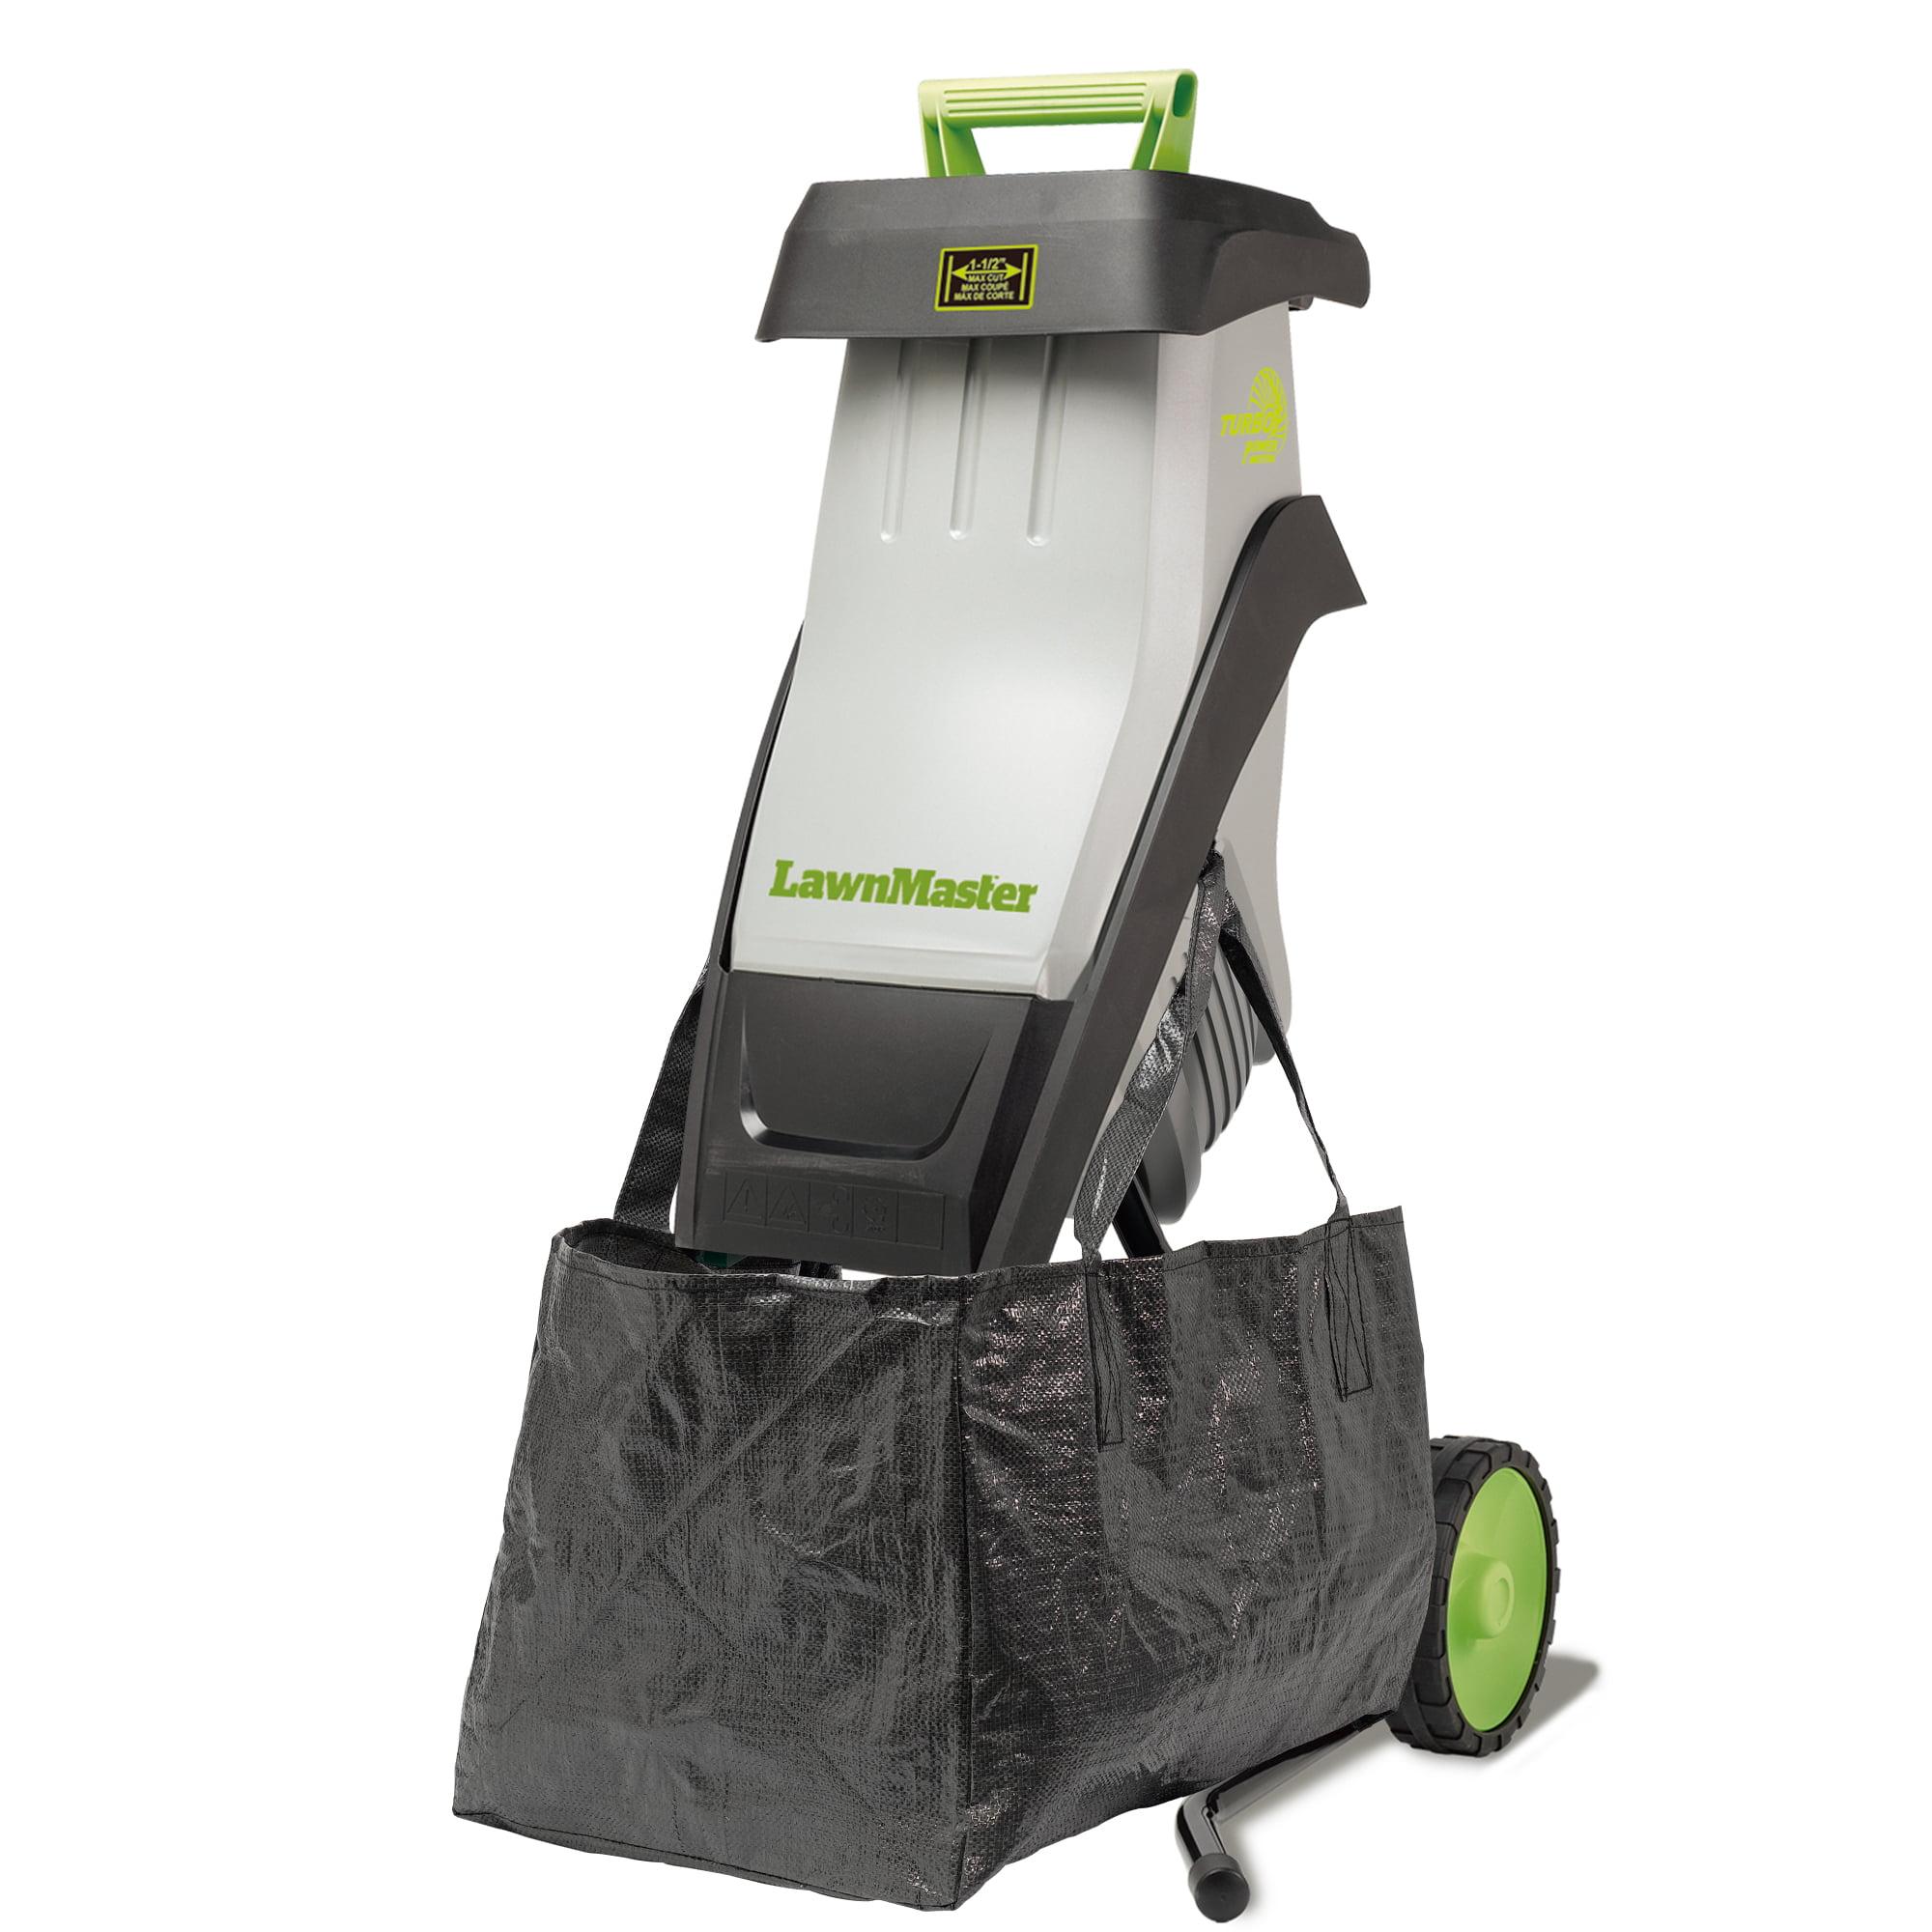 LawnMaster 15-Amp Chipper/Shredder - Walmart.com